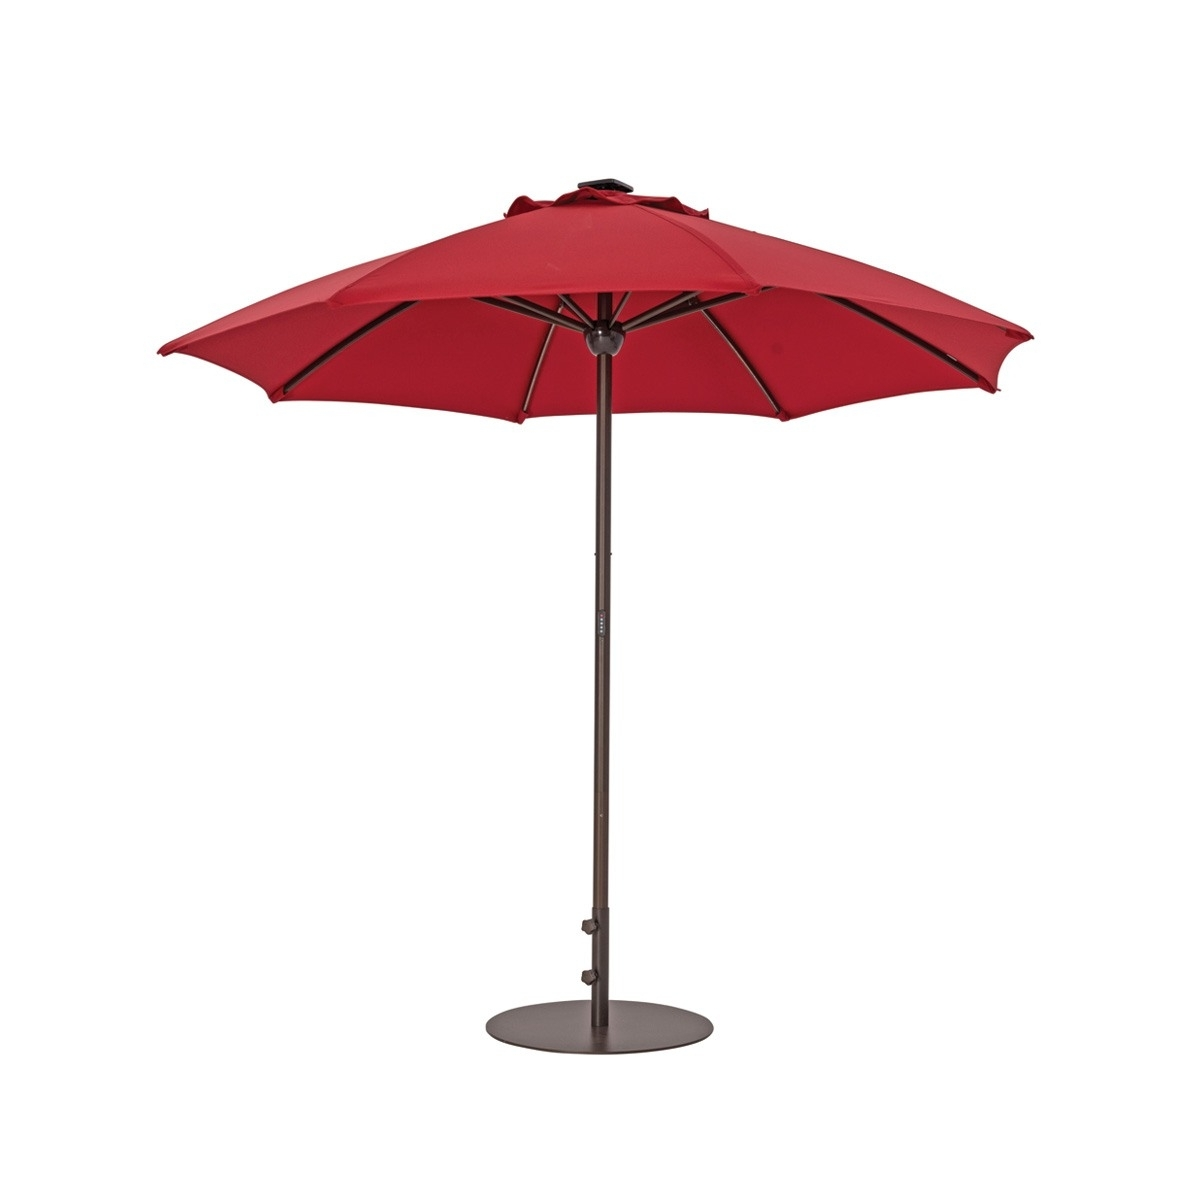 Solar In Sunbrella Patio Umbrellas With Solar Lights (View 9 of 20)